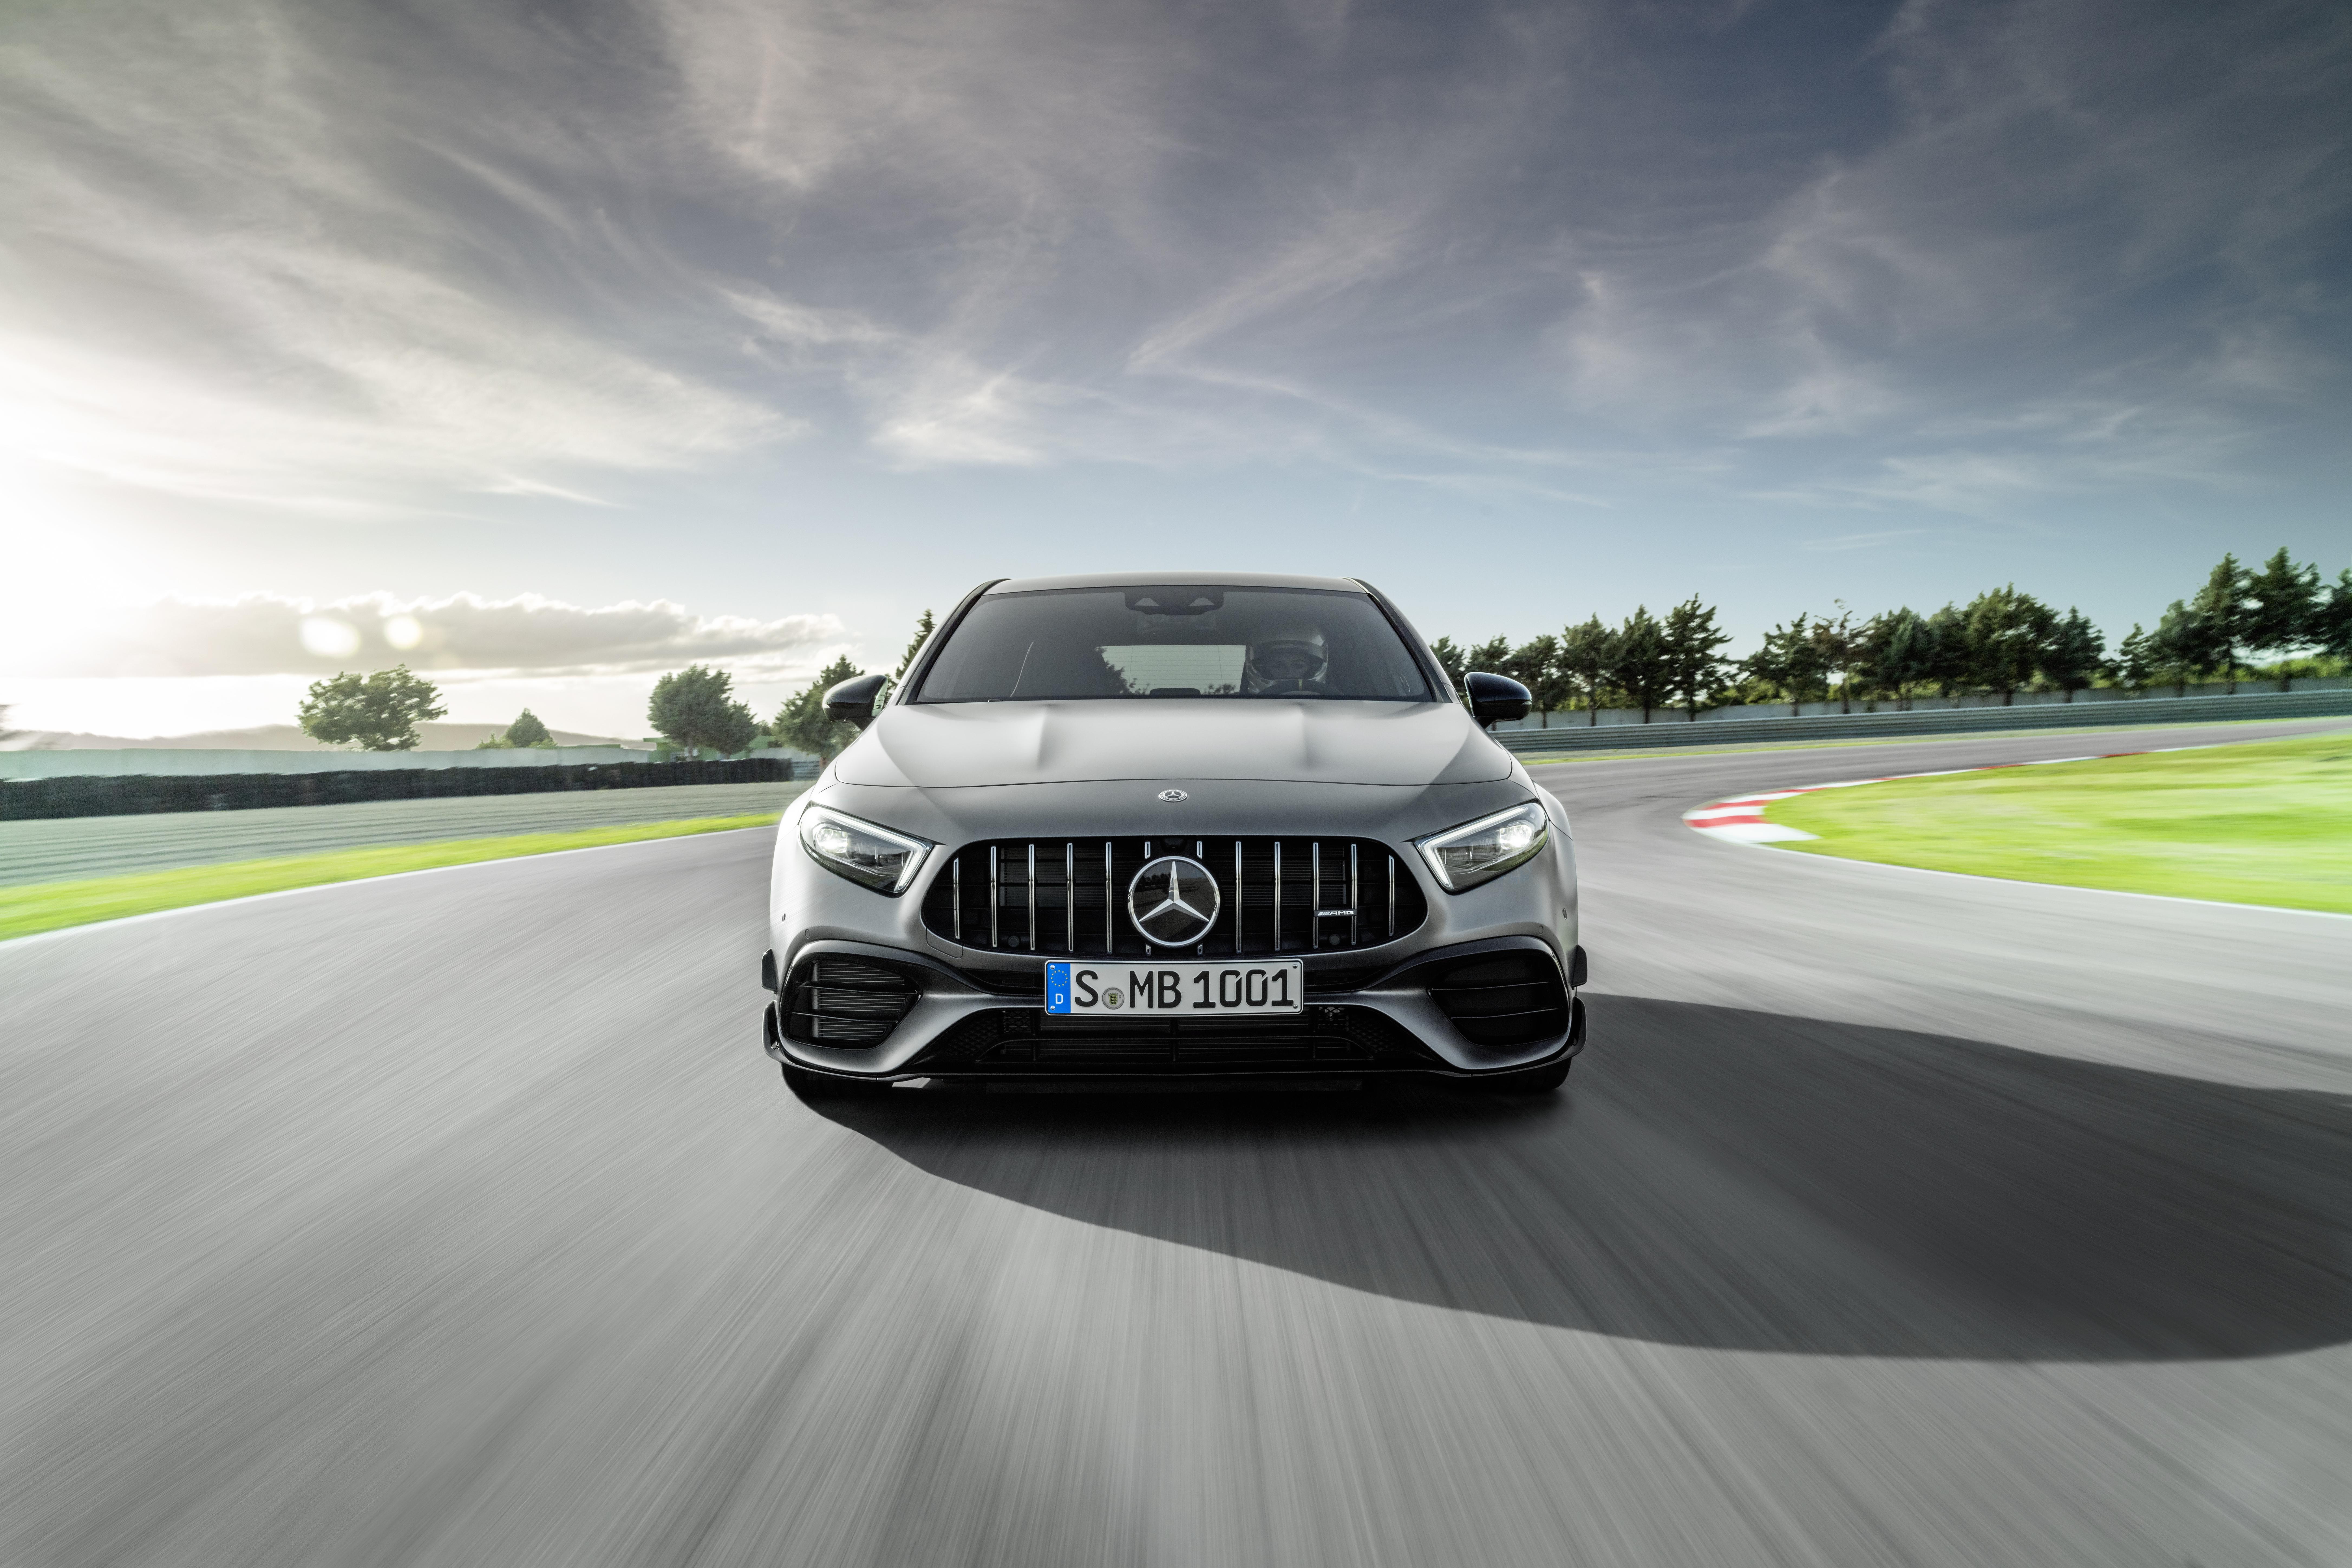 Mercedes-AMG A 45 S 4MATIC+ (2019)  Mercedes-AMG A 45 S 4MATIC+ (2019)